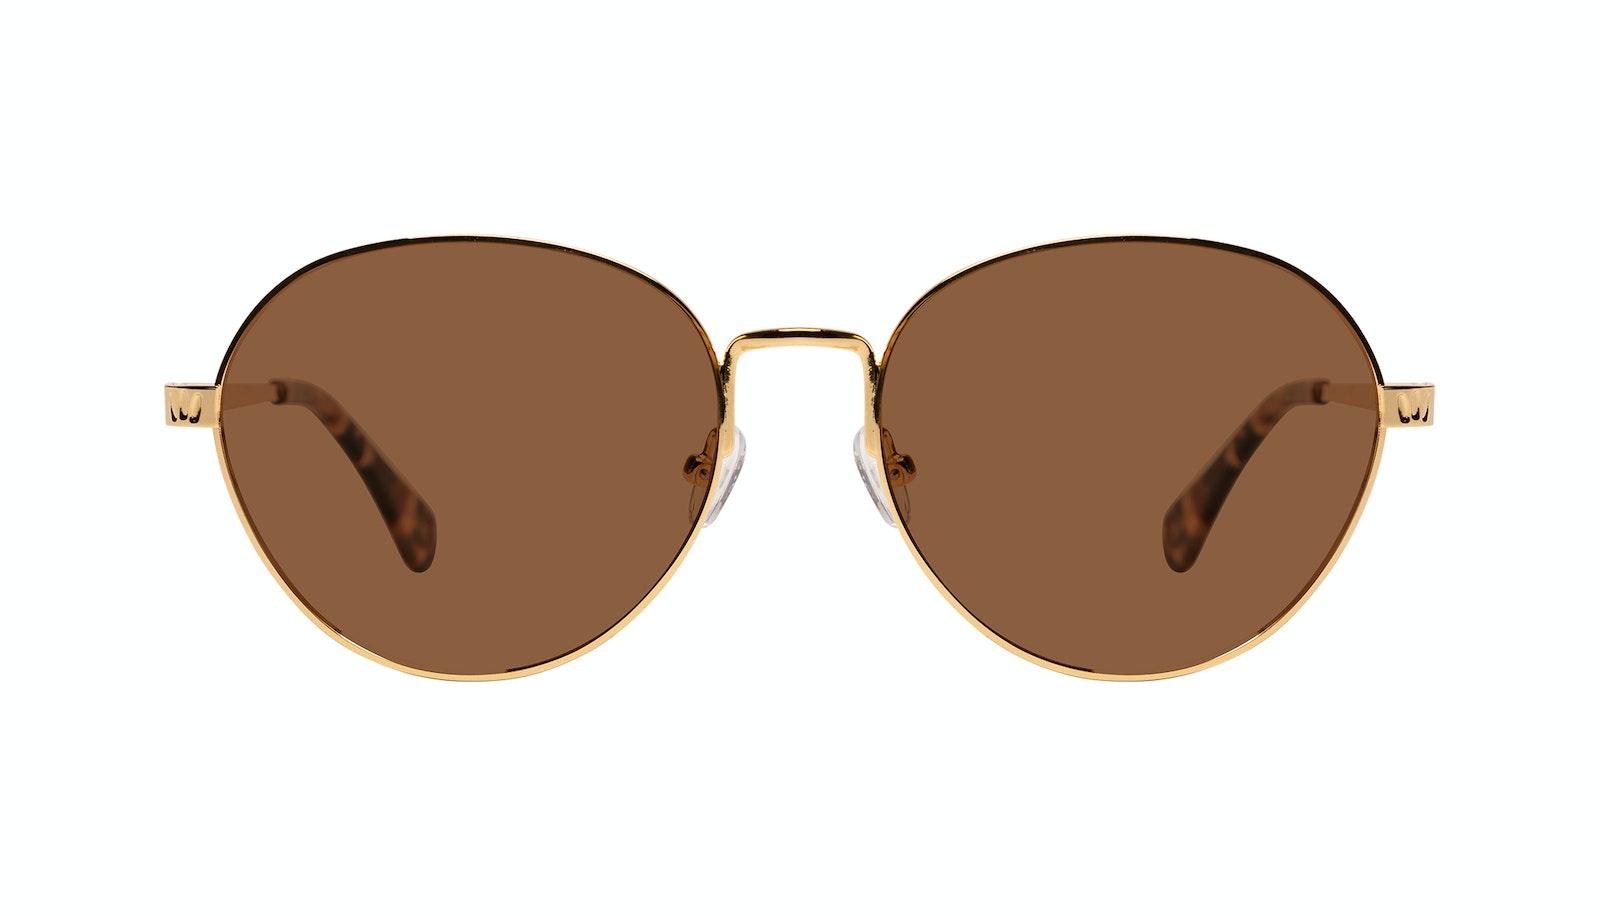 Affordable Fashion Glasses Round Sunglasses Women Brace Plus Gold